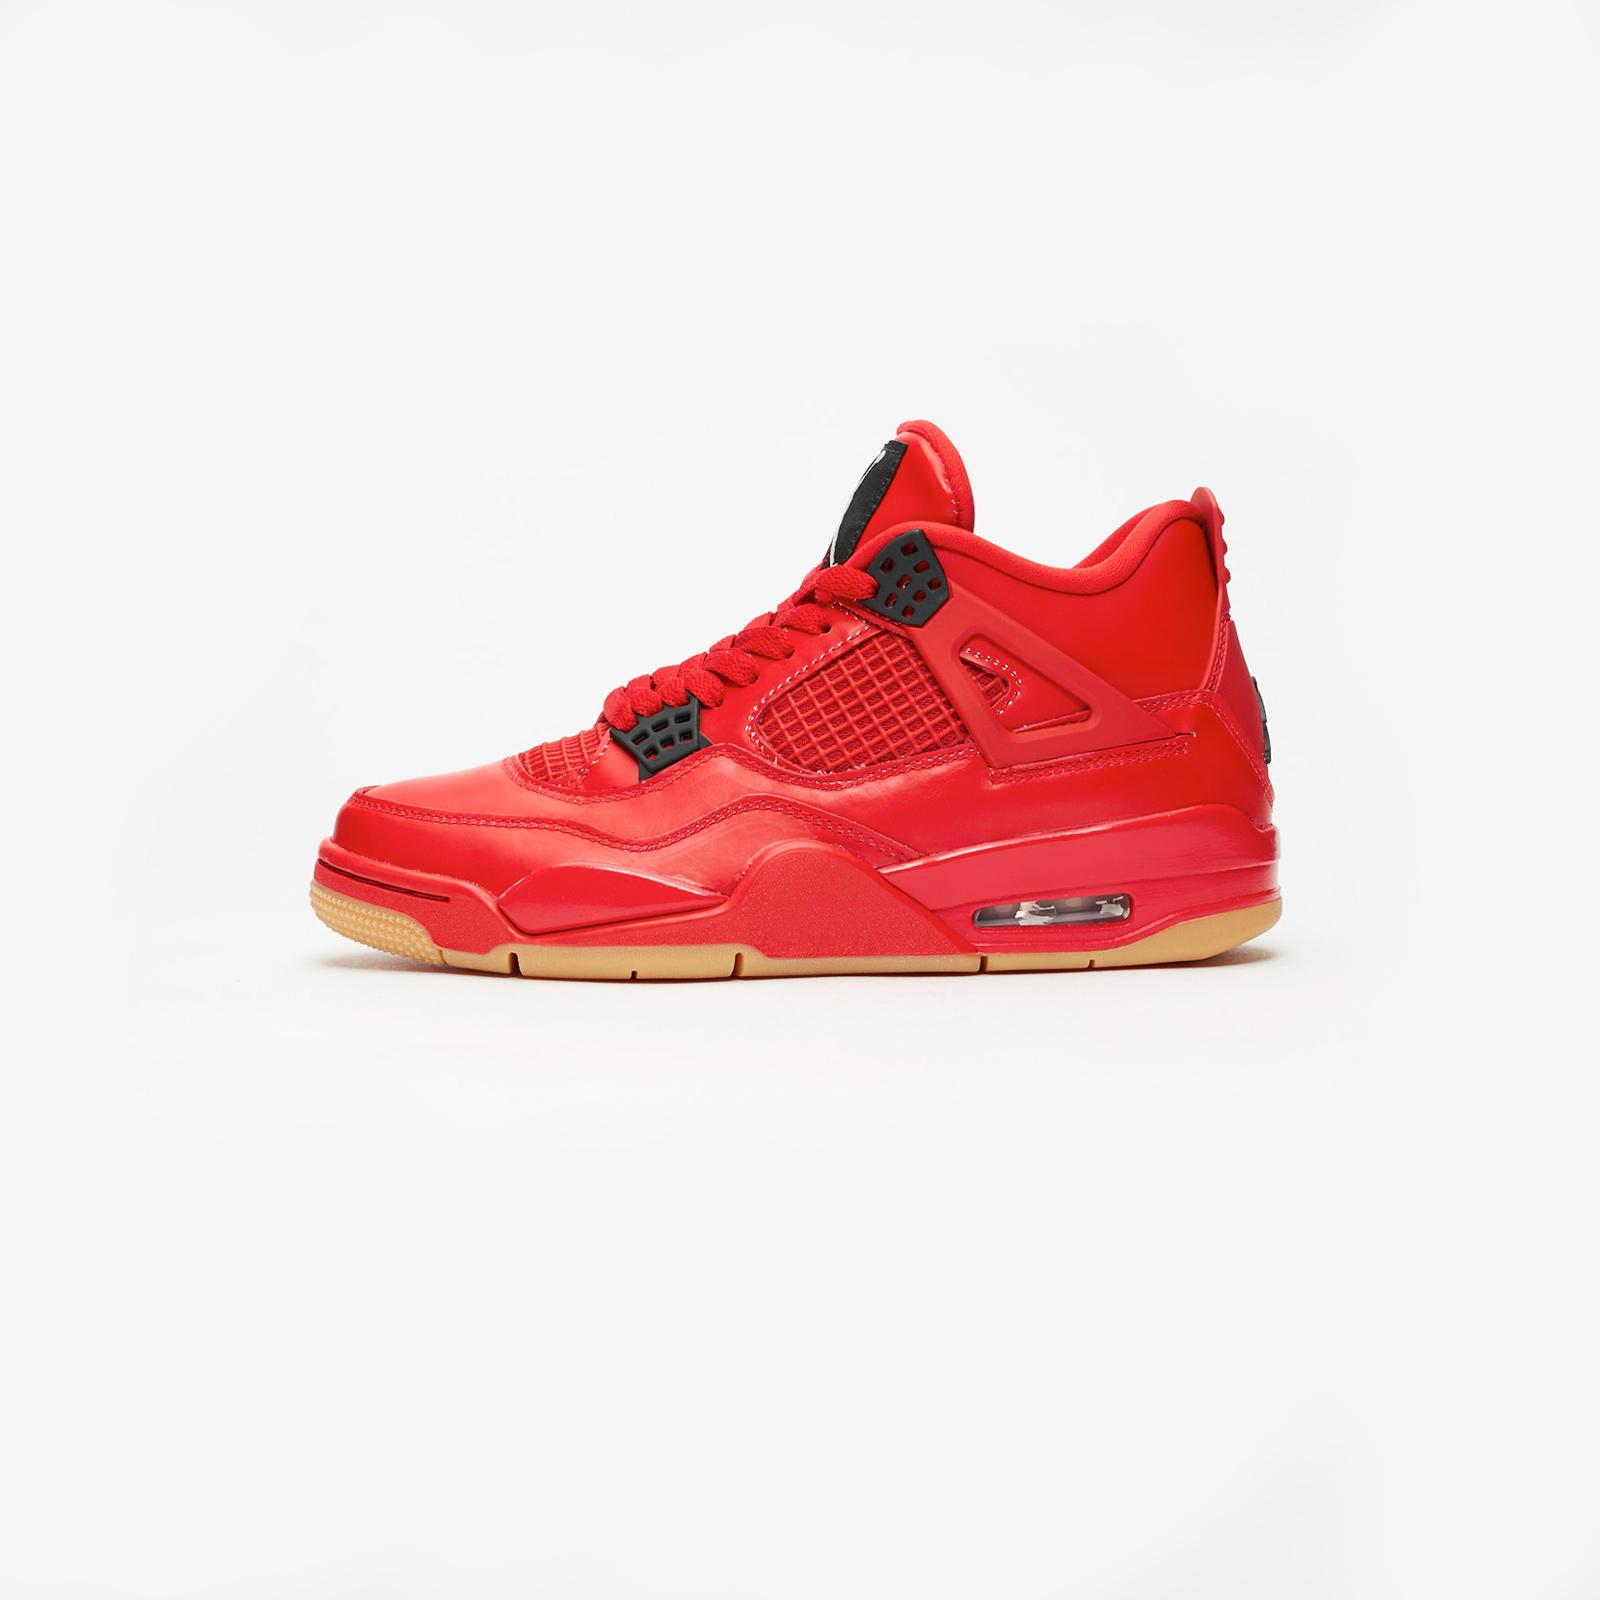 Jordan Brand Wmns Air Jordan 4 Retro